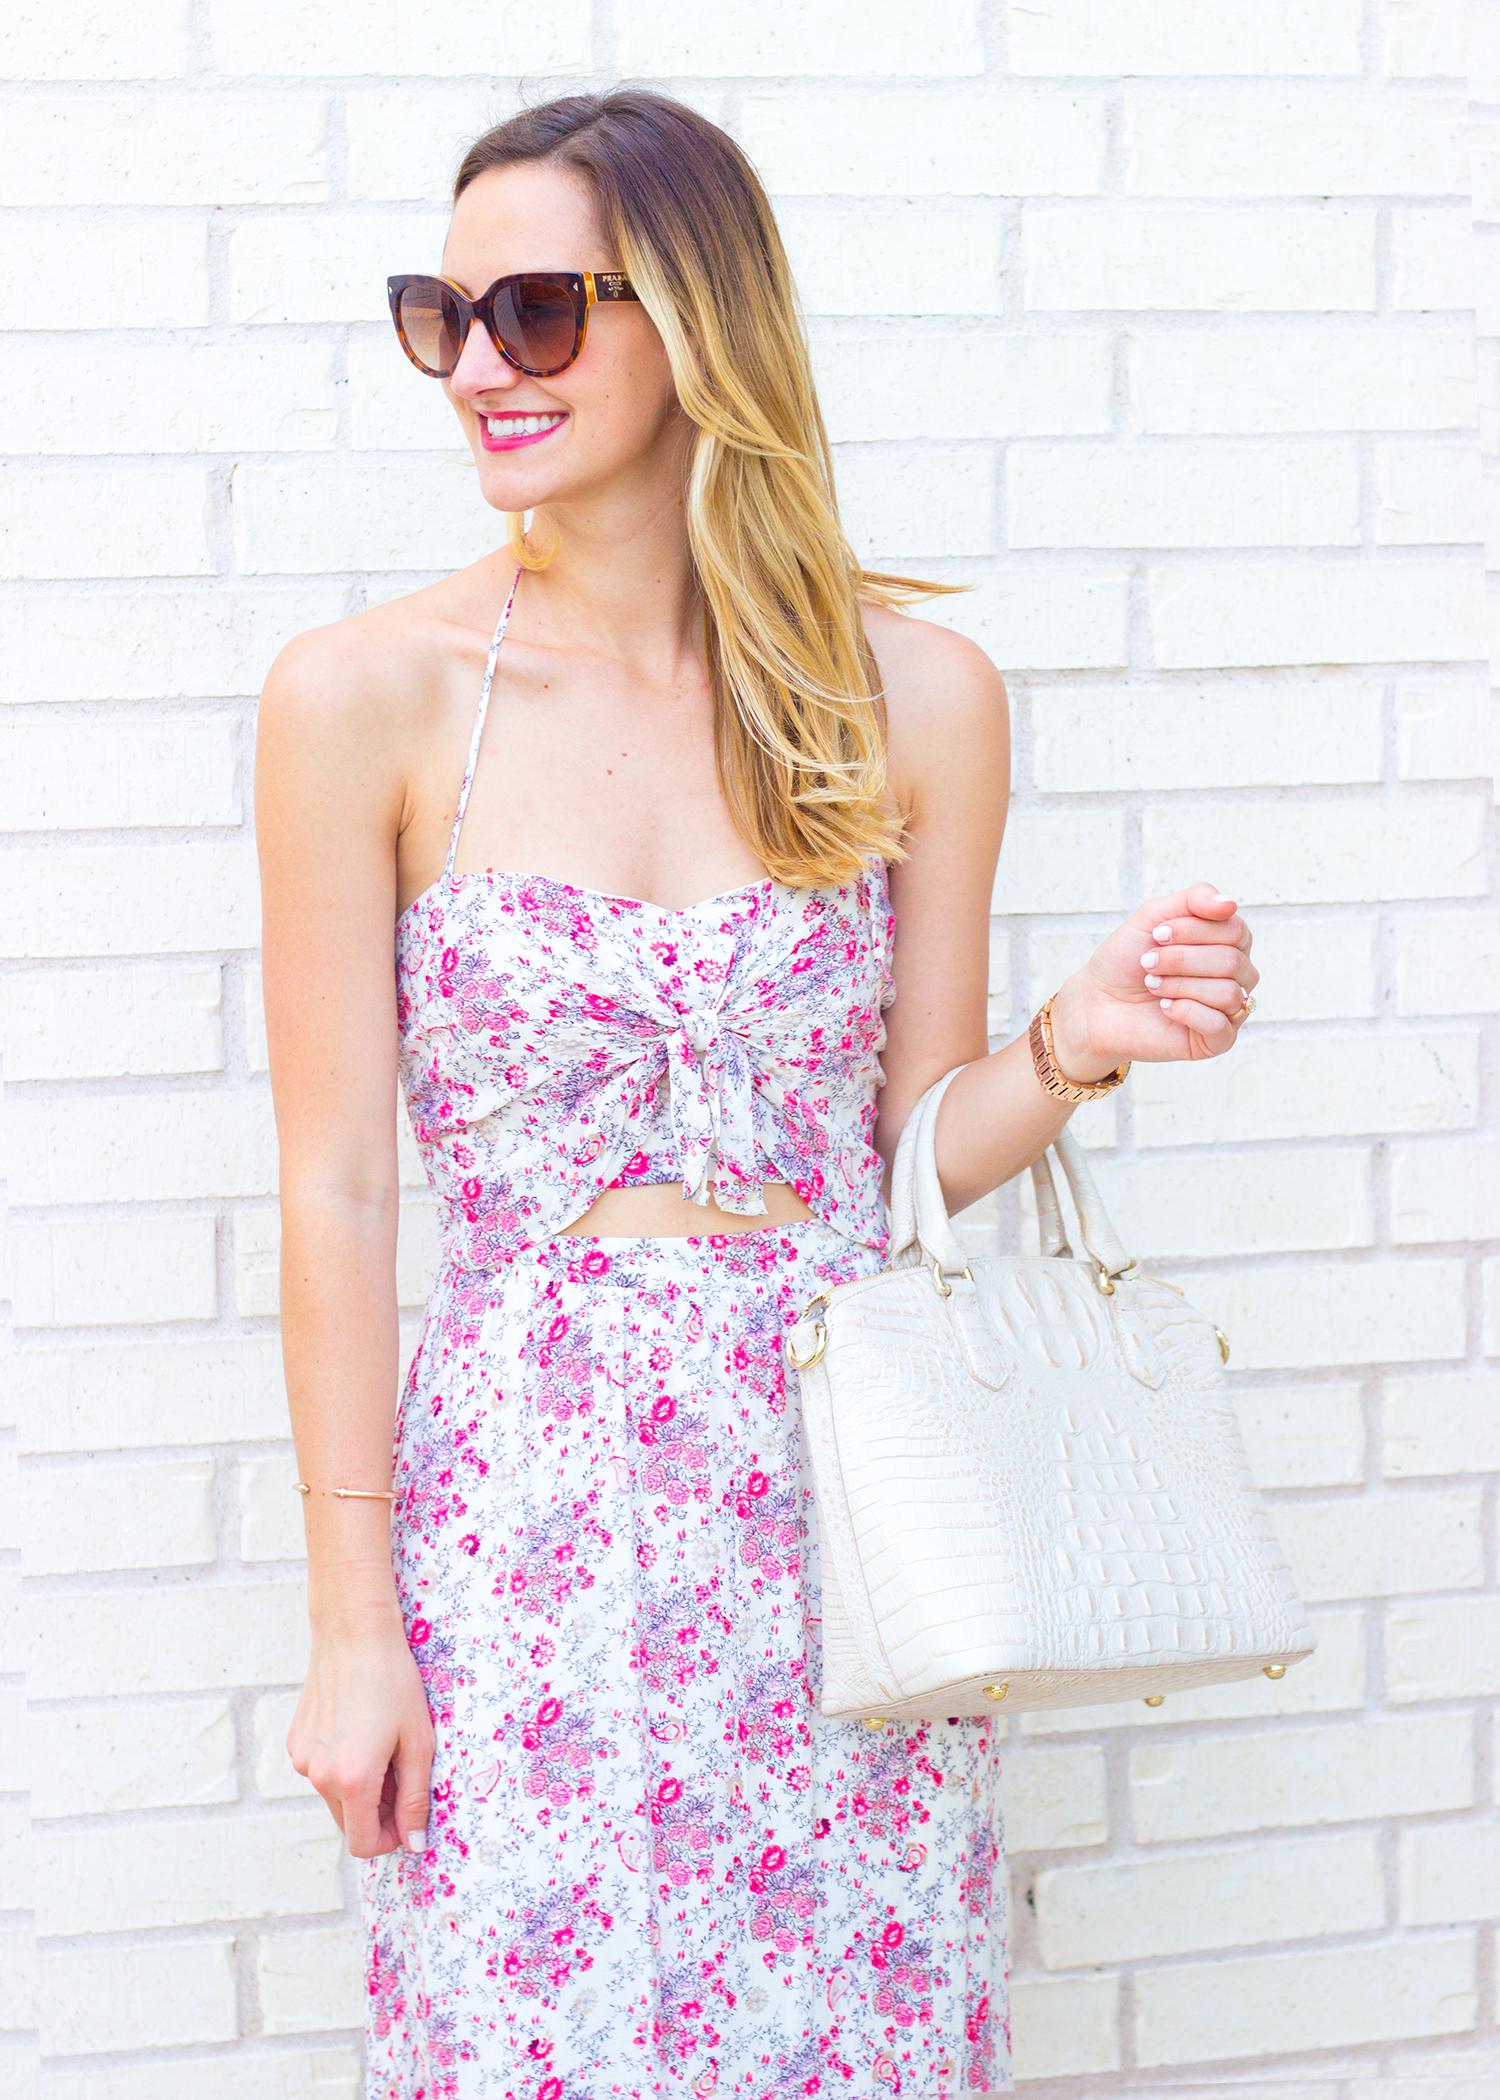 livvyland-blog-olivia-watson-austin-texas-fashion-blogger-astr-pink-floral-cutout-halter-sweetheart-maxi-dress-brahmin-duxbury-handbag-cava-7